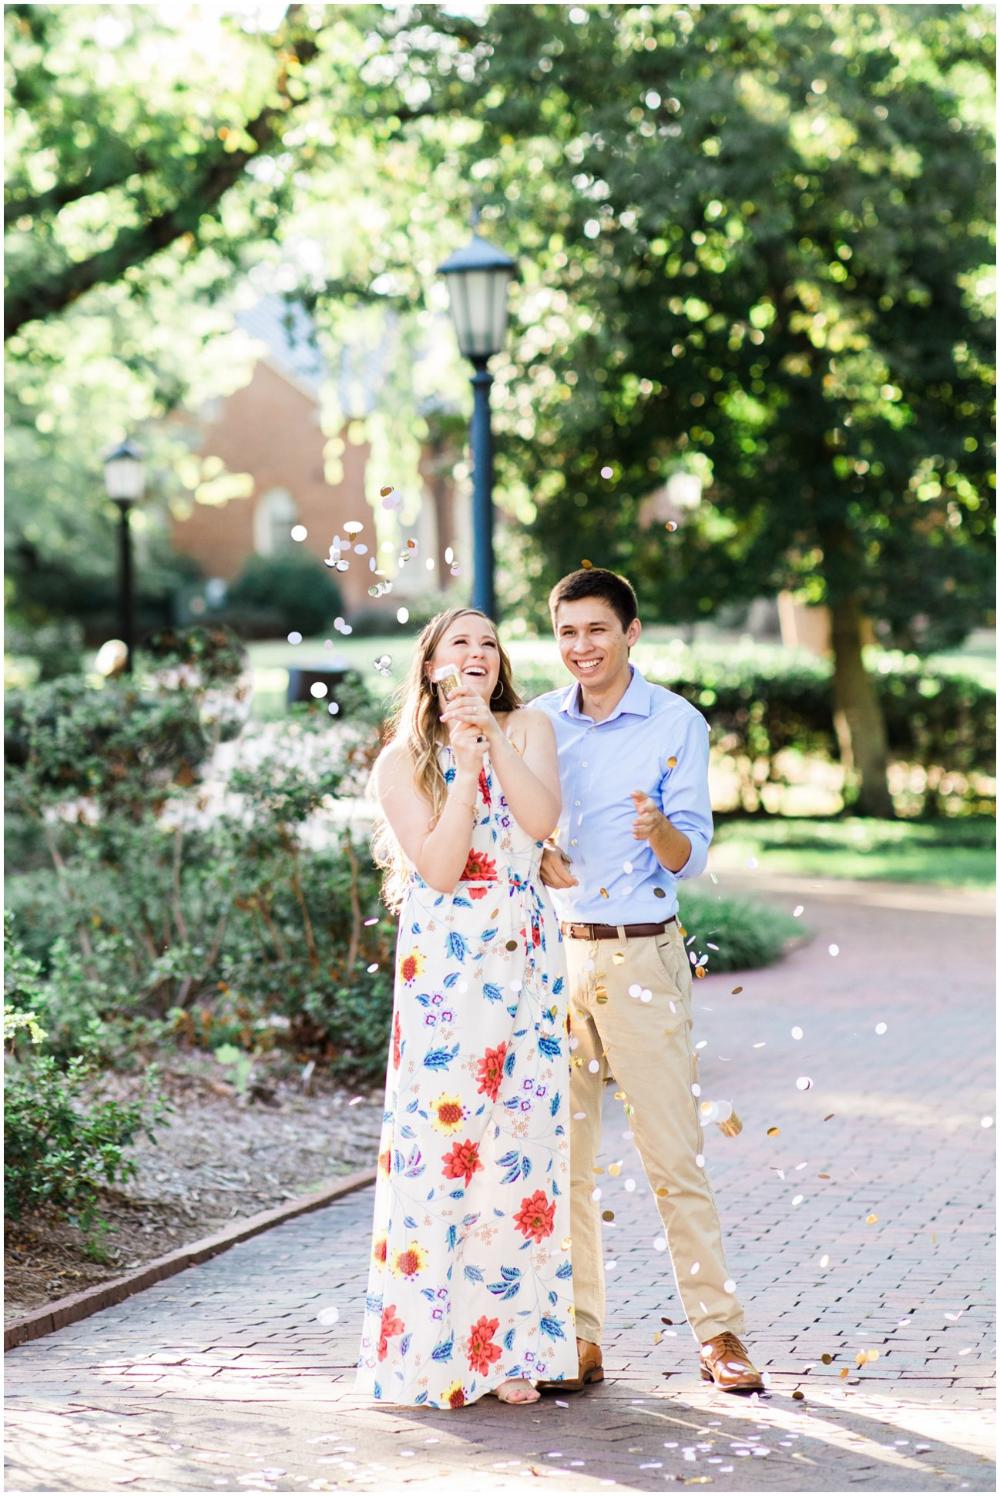 Unc Engagement Session Chapel Hill Nc Ashley Zach Raleigh Wedding Photographer Engagement Session Virginia Wedding Photographer